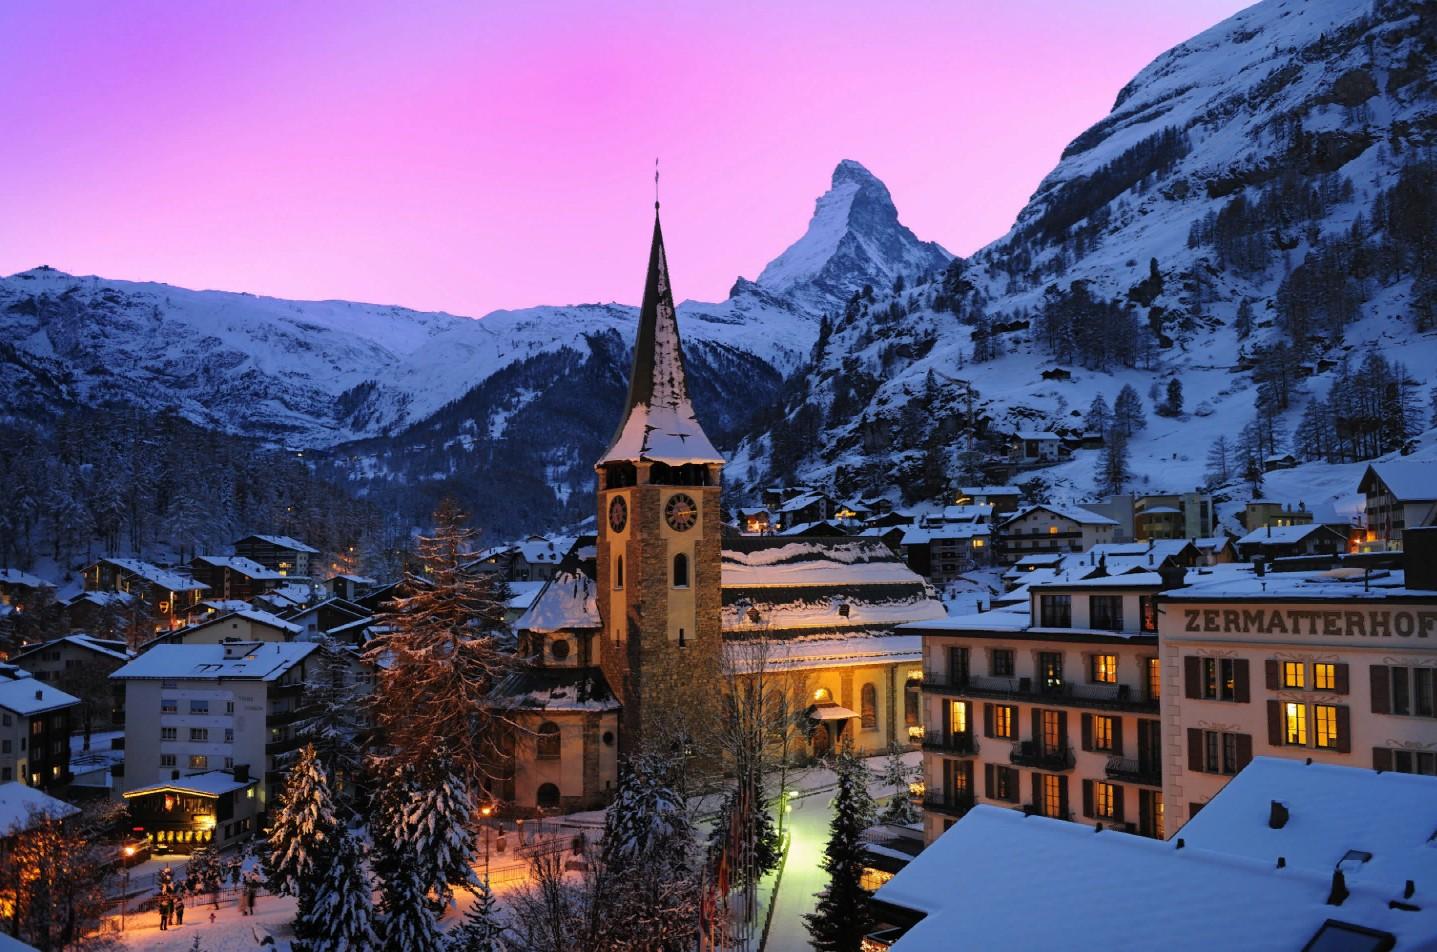 Церматт ( Zermatt), Швейцария